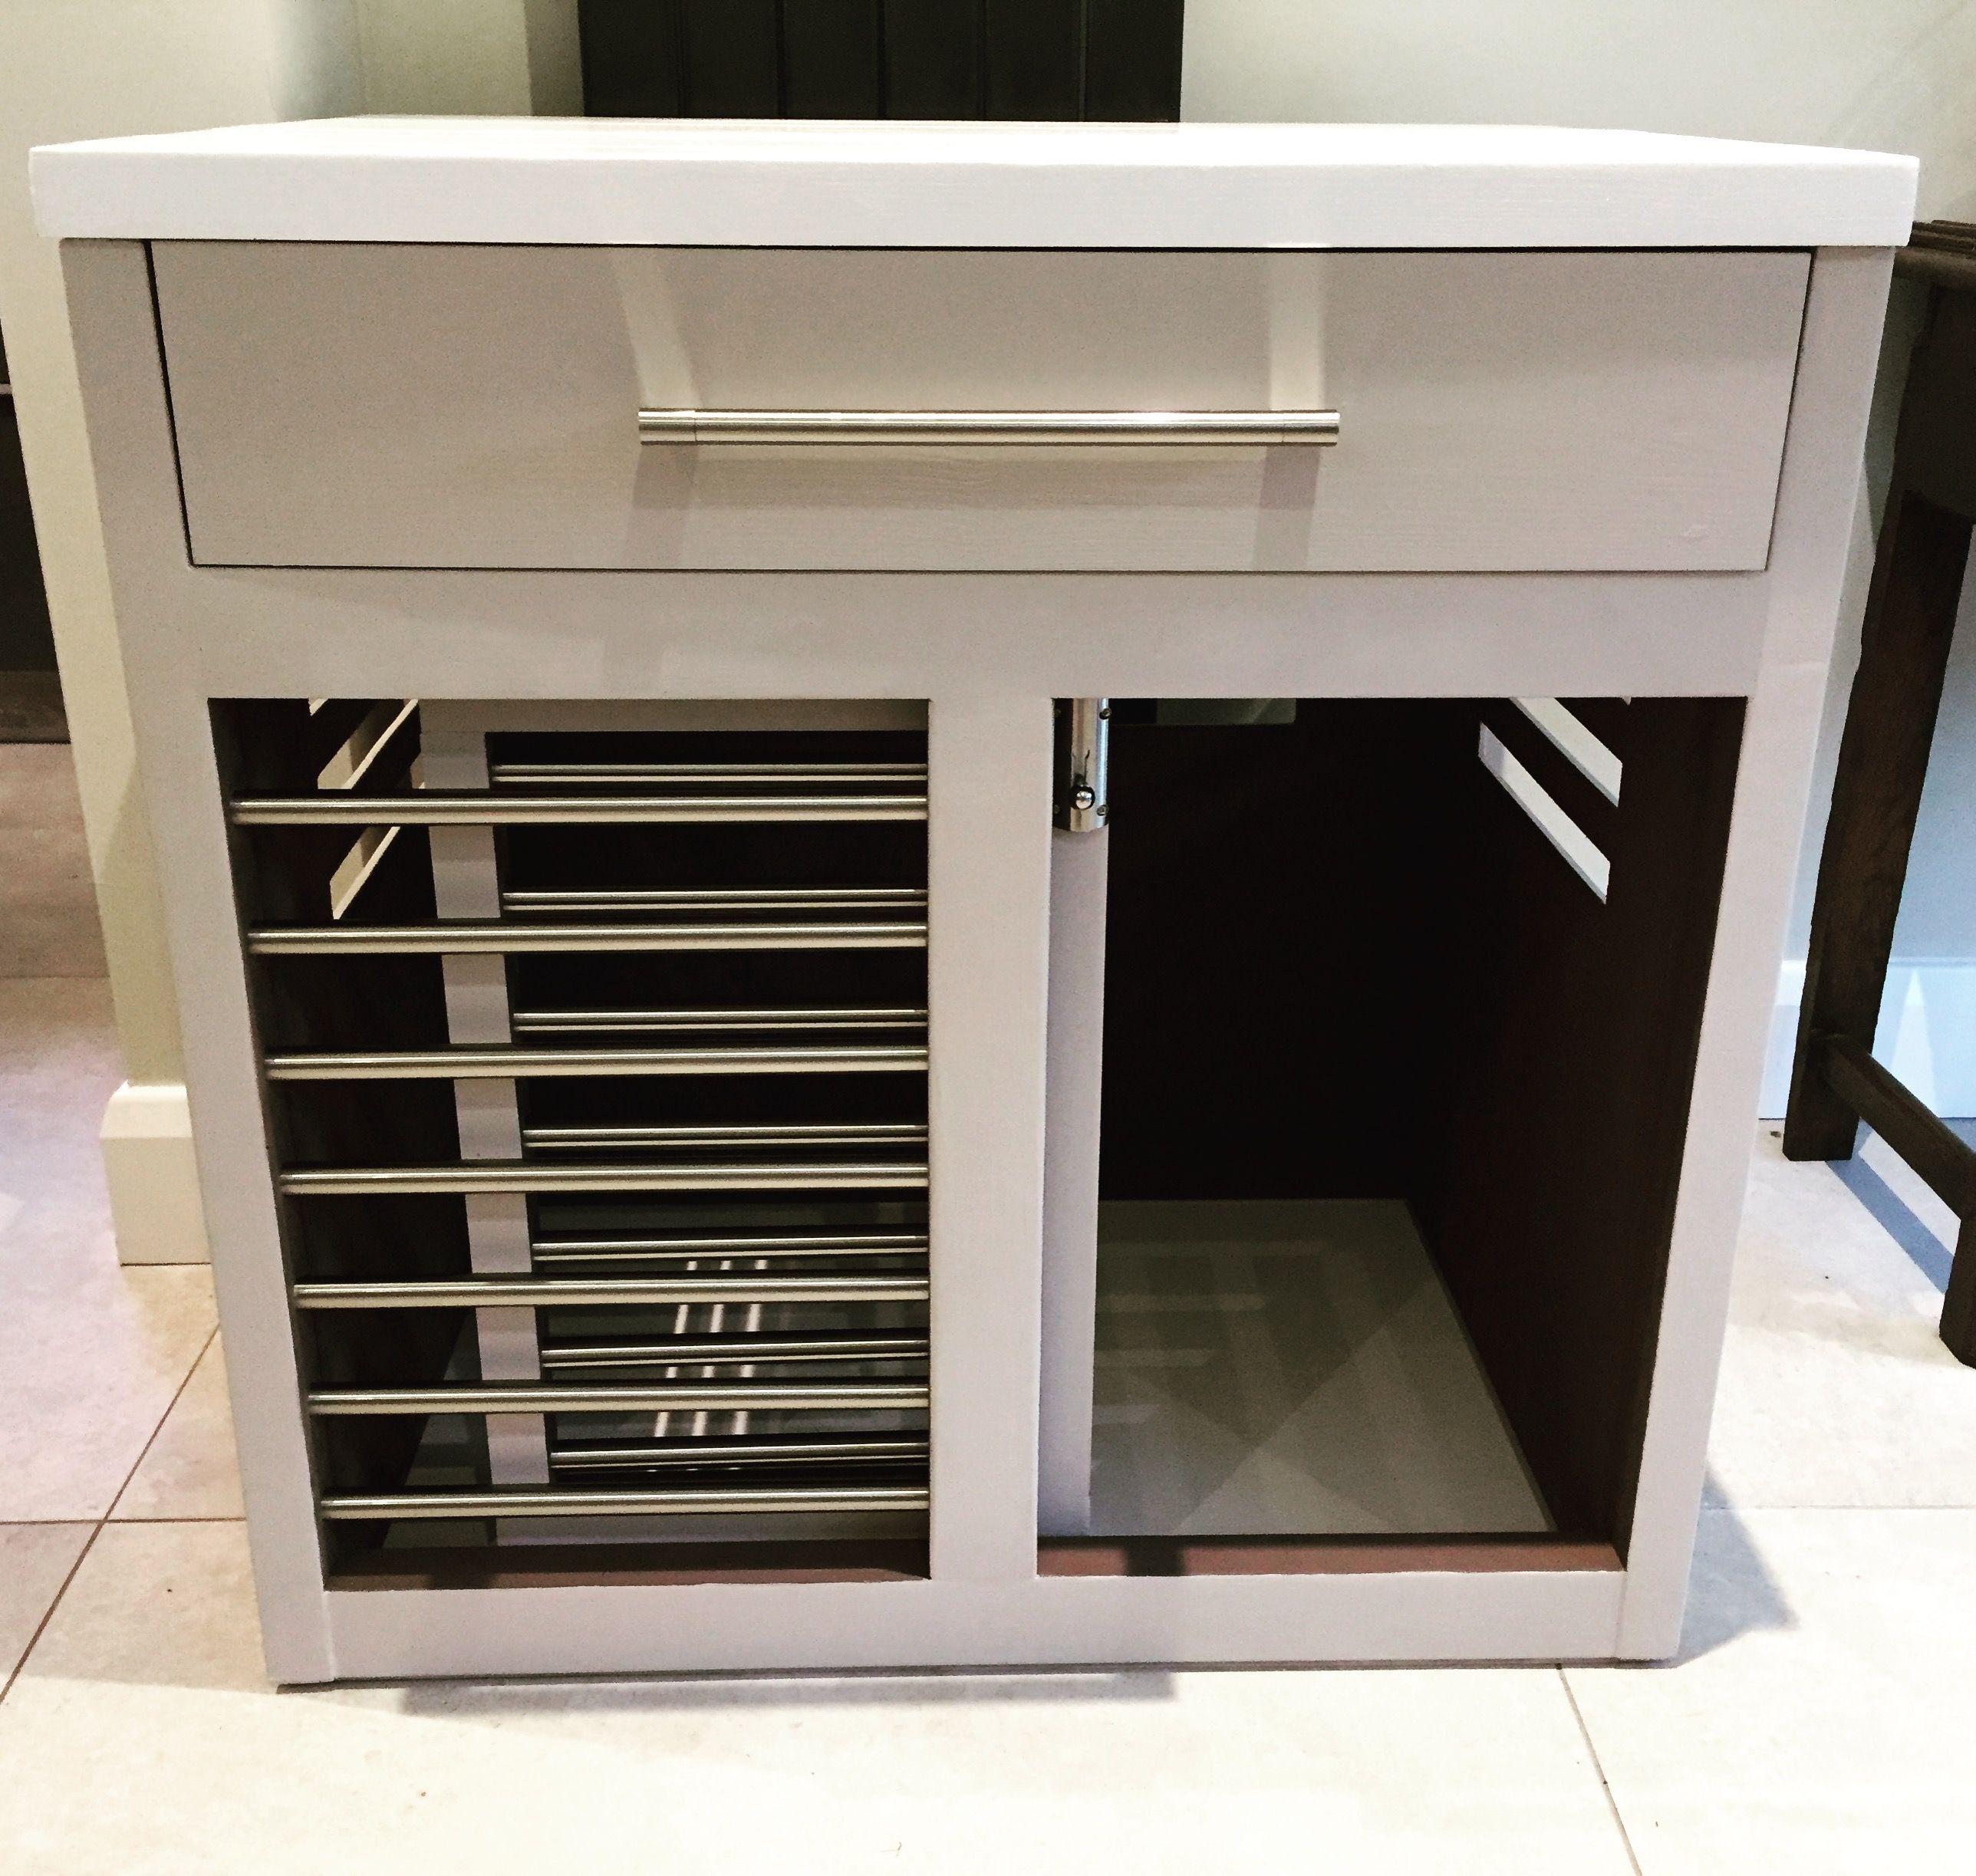 sliding door and treat drawer👌🐾 handmade custom dog crates in  - sliding door and treat drawer👌🐾 handmade custom dog crates in the ukvisit us